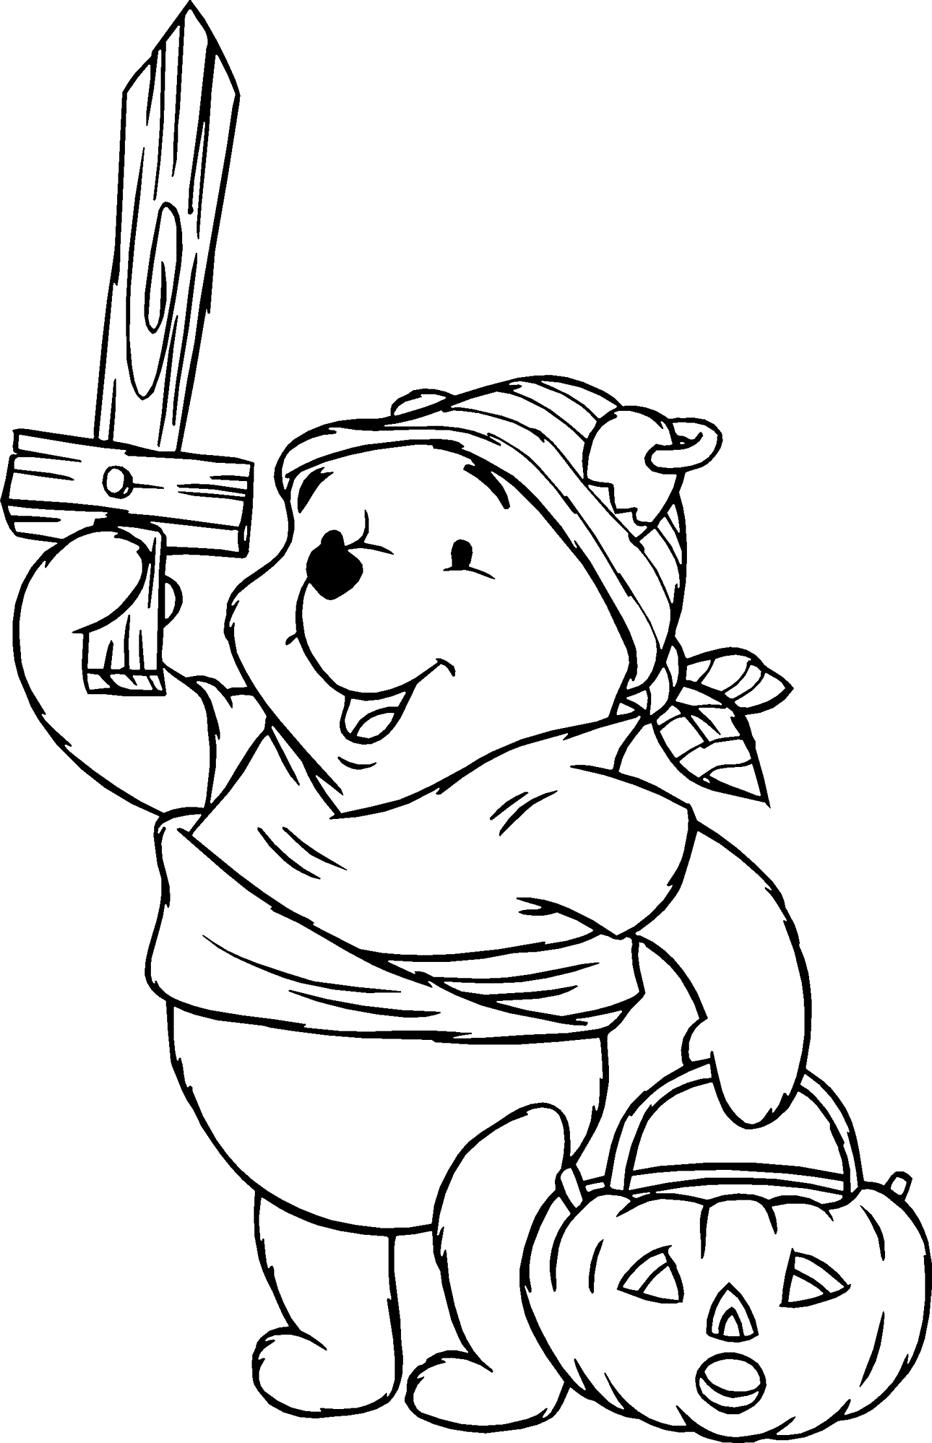 Dibujos de Winnie Pooh para Colorear, Pintar e Imprimir Gratis